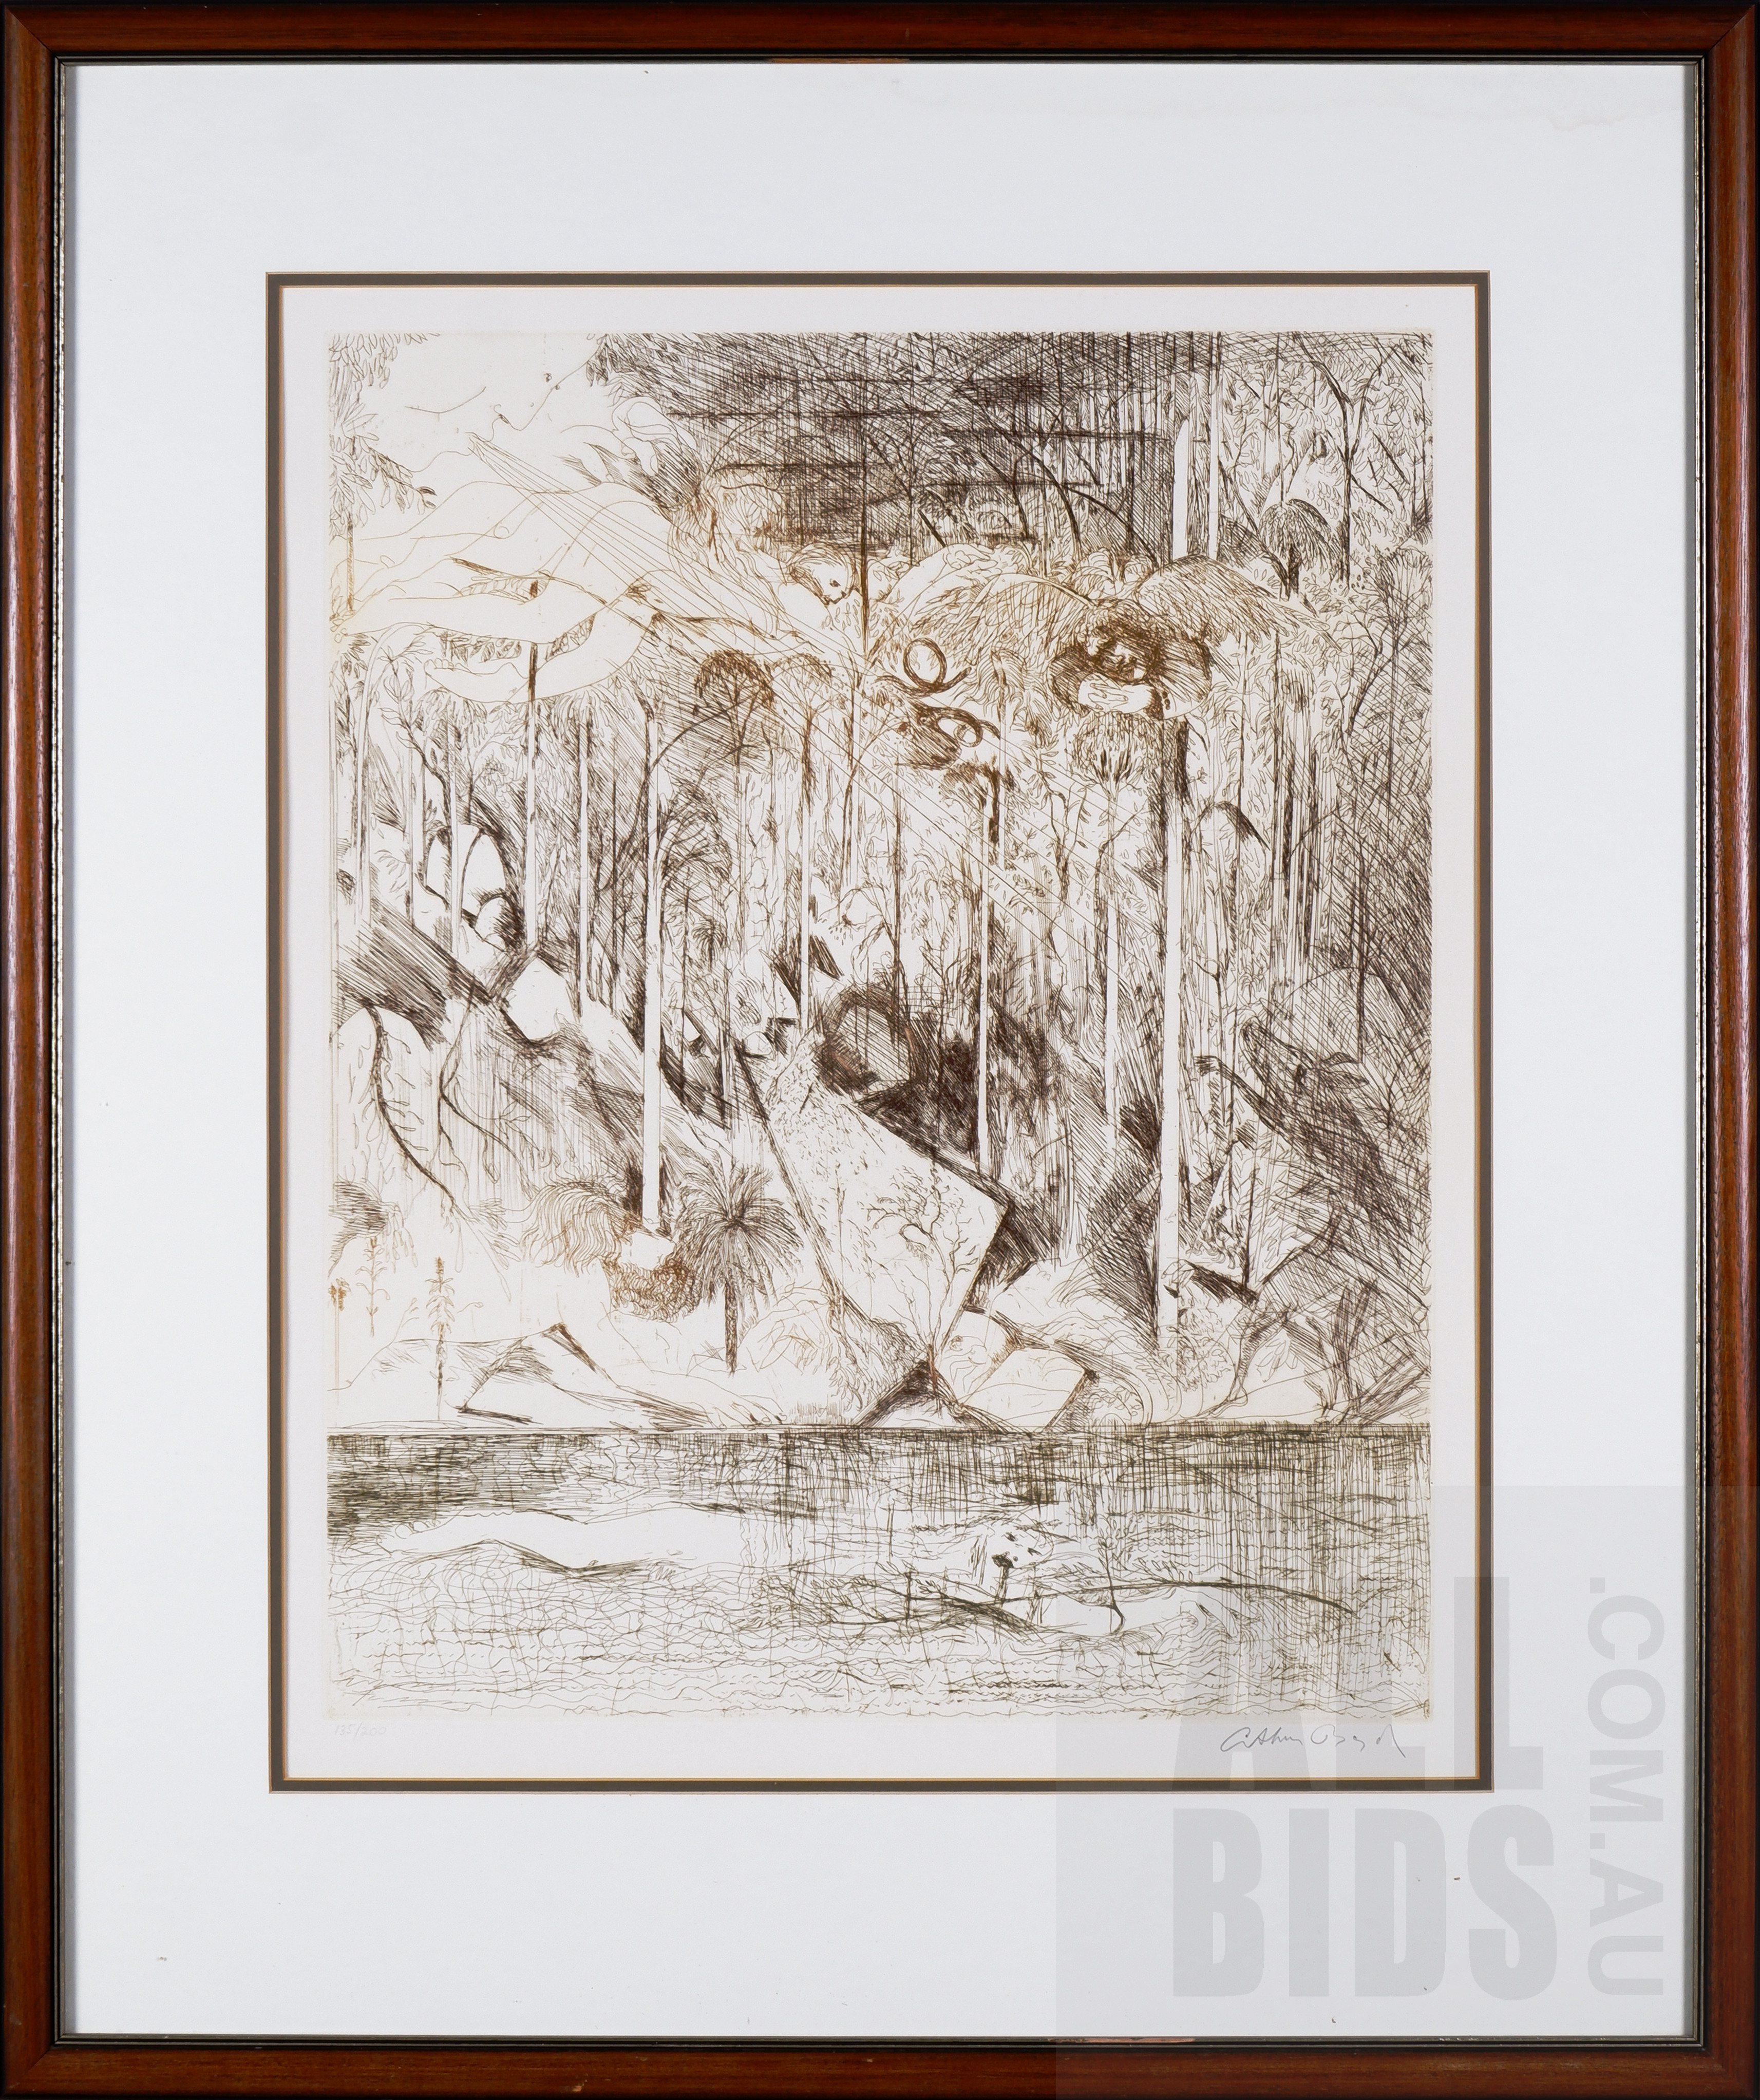 'Arthur Boyd (1920-1999), Rockpool Spirits & Wind, Shoalhaven, Etching, 64 x 51 cm (image size)'